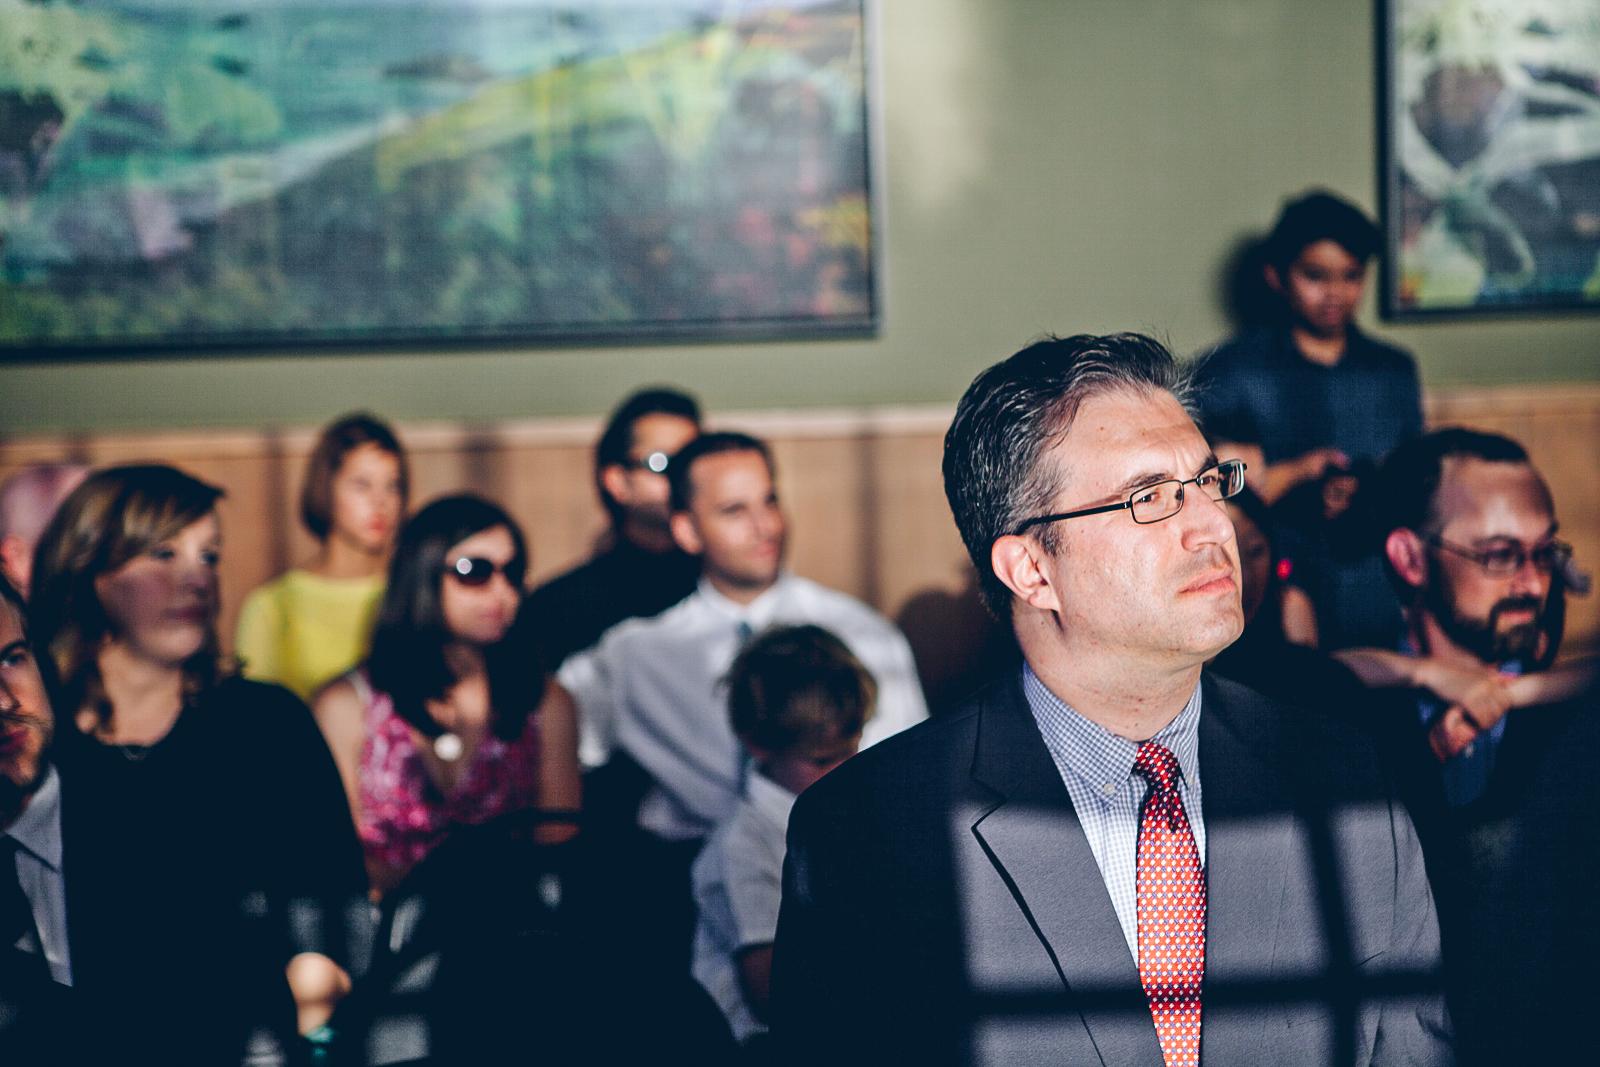 greens_restaurant_wedding_photography_san_franscisco_ebony_siovhan_bokeh_photography_43.jpg